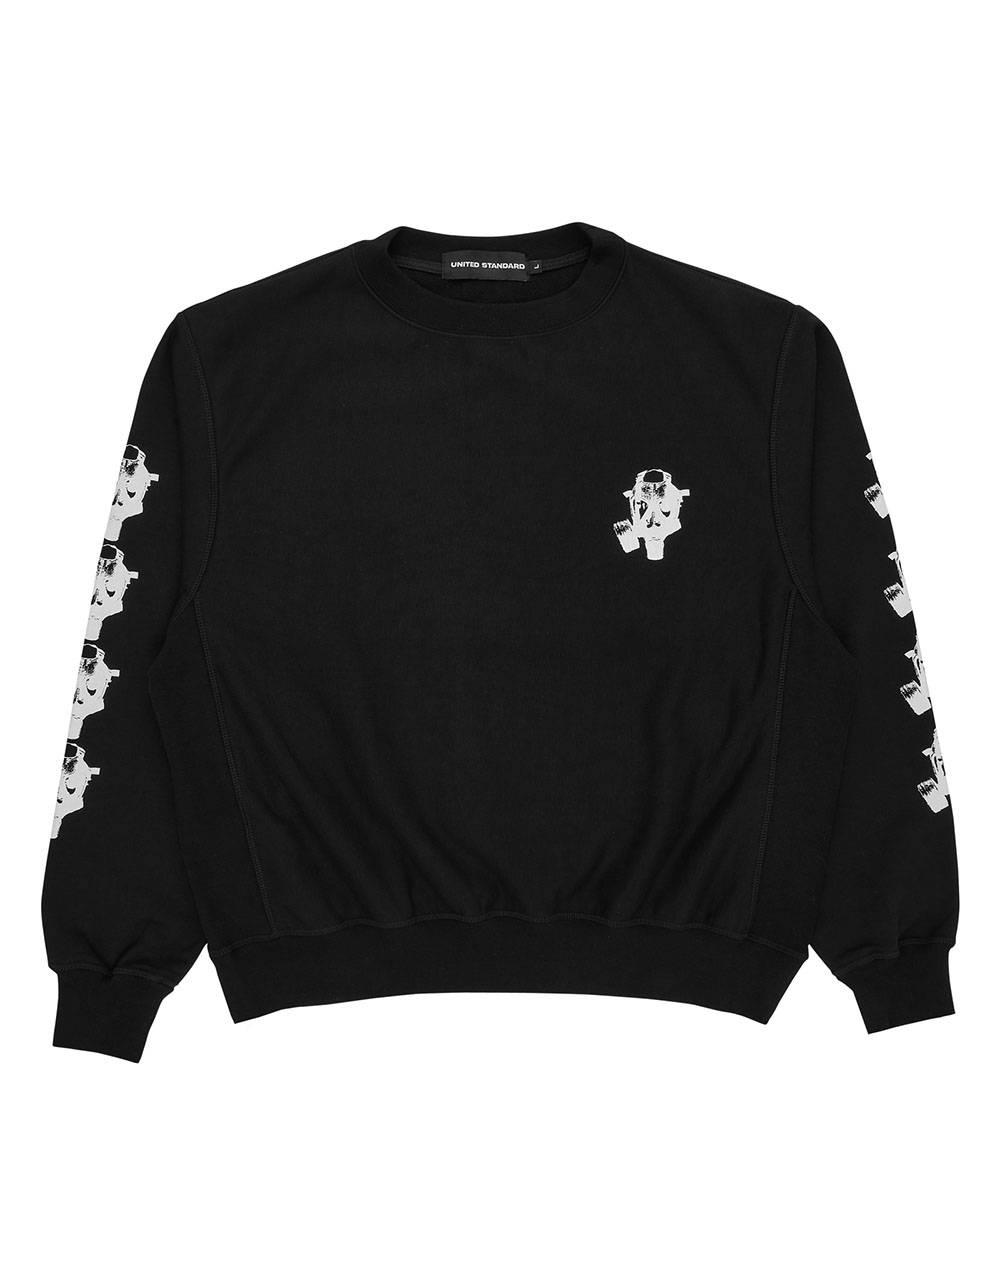 United Standard Mask crewneck sweater - black United Standard Sweater 179,00€